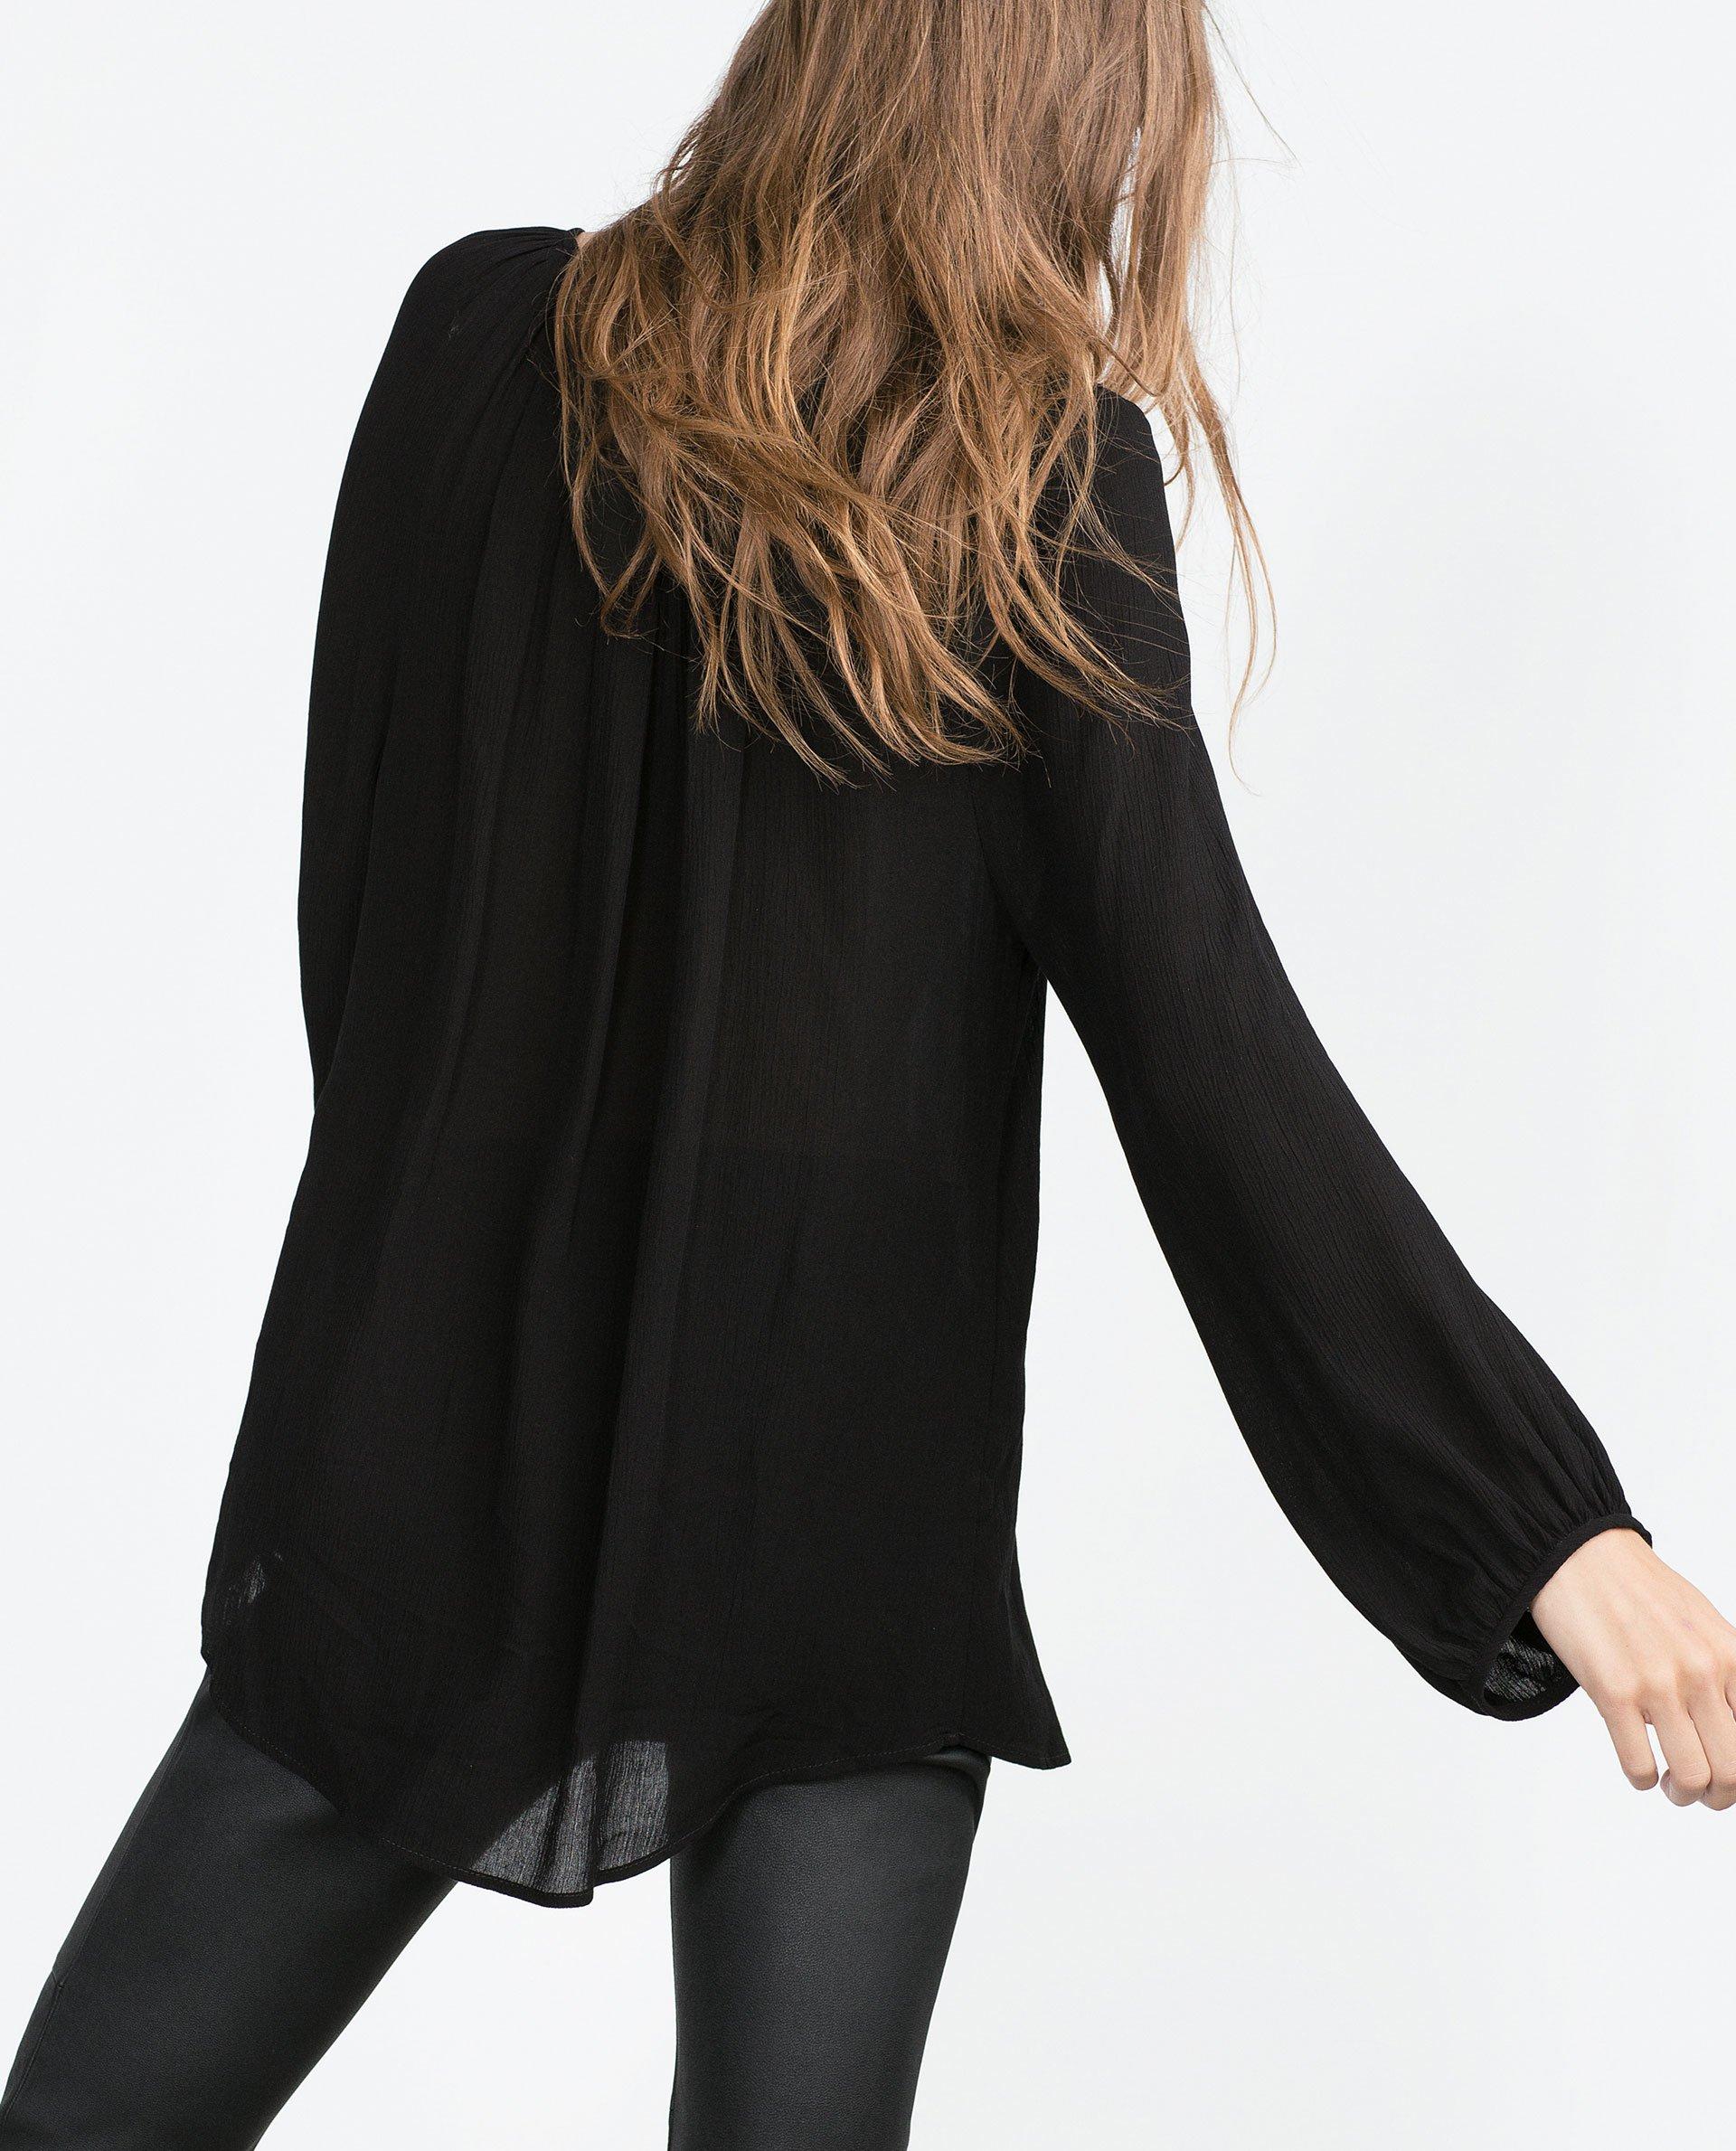 Zara Online Blouse 15